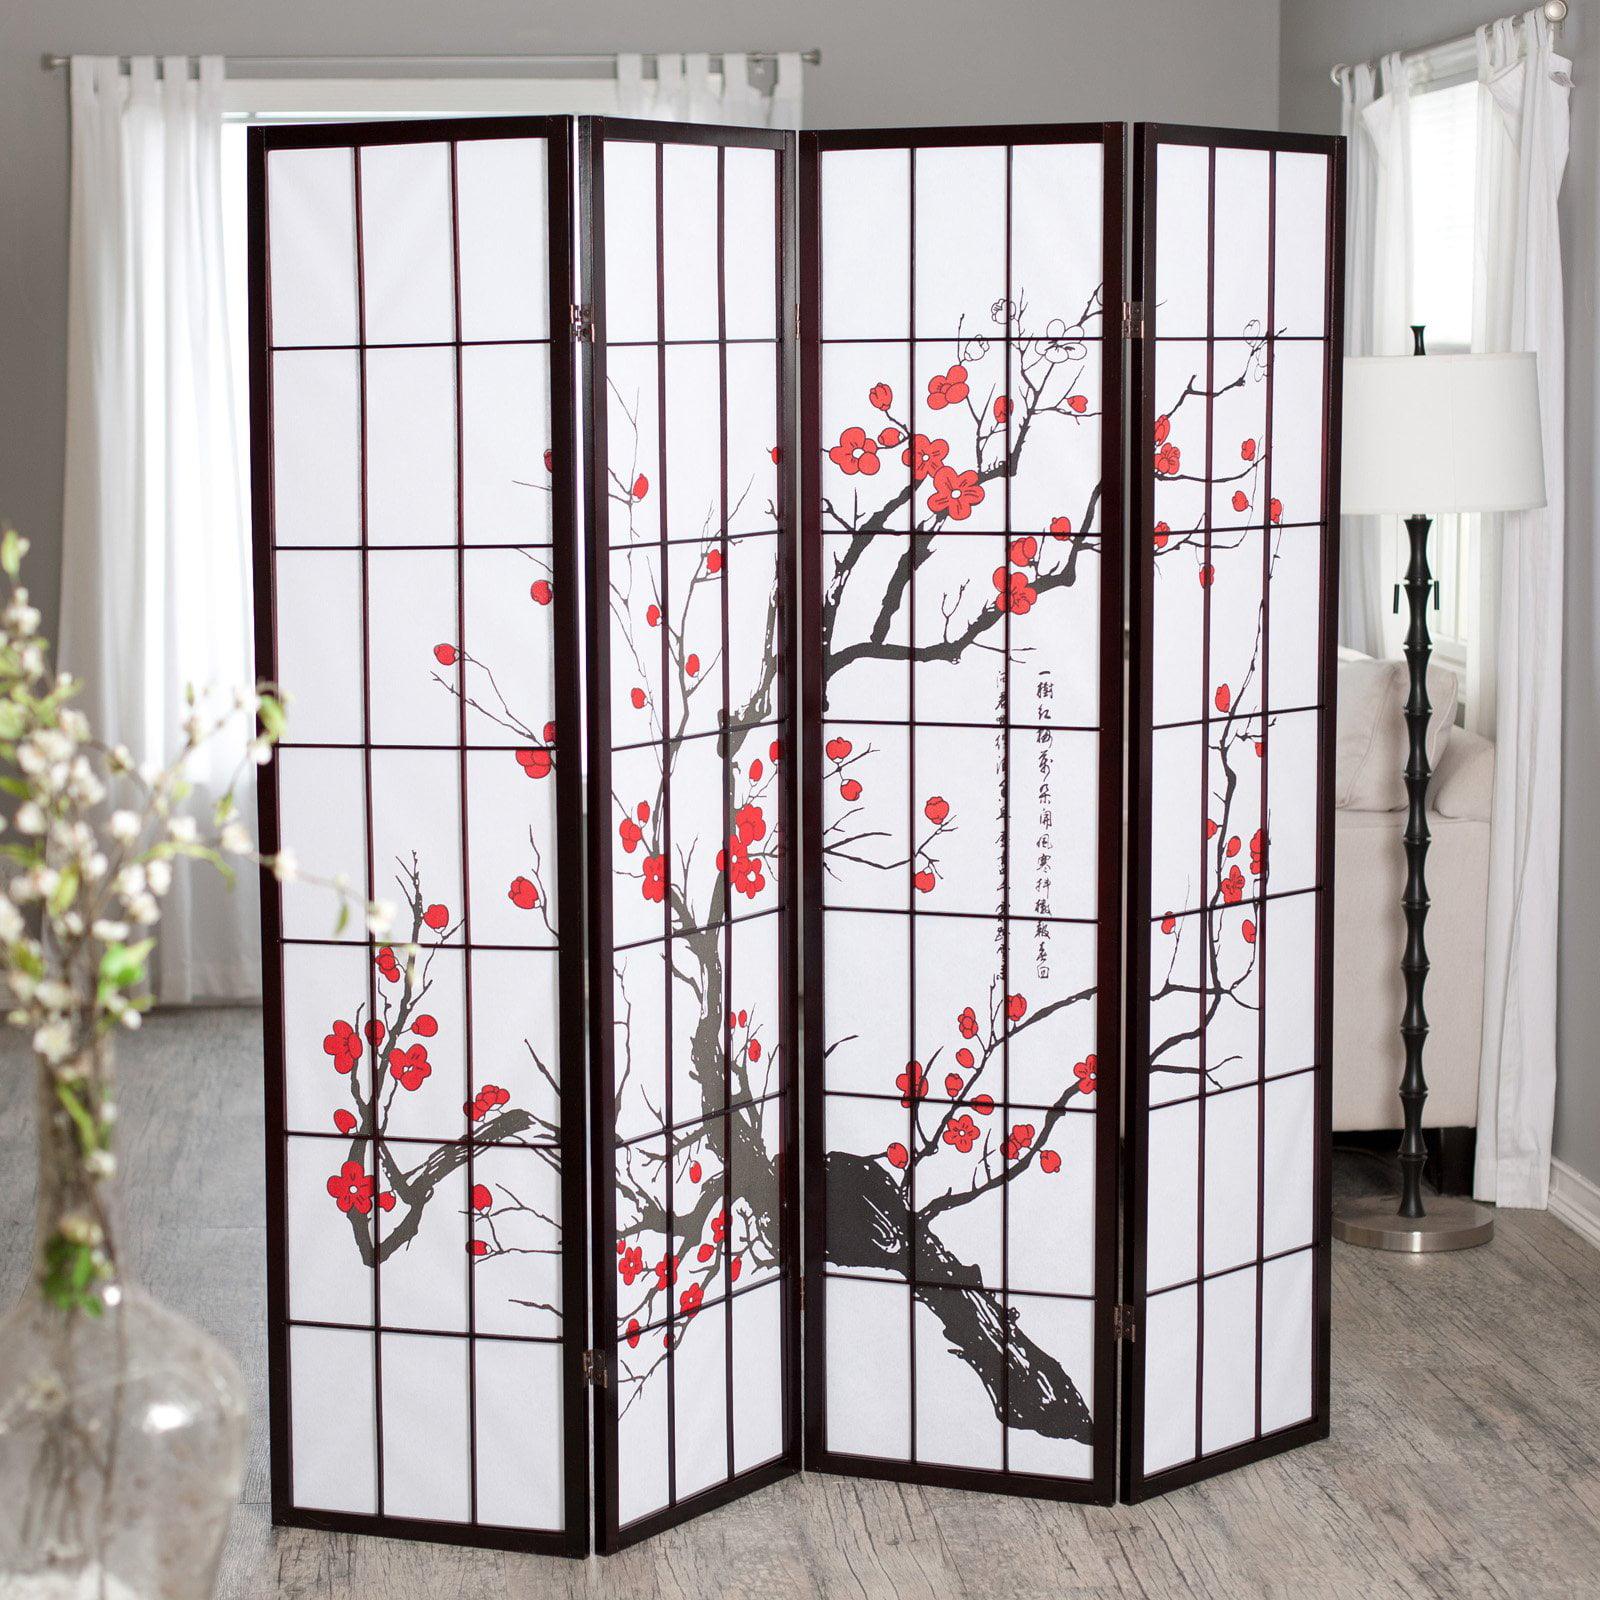 Divider Furniture cherry blossom rosewood 4 panel room divider - walmart